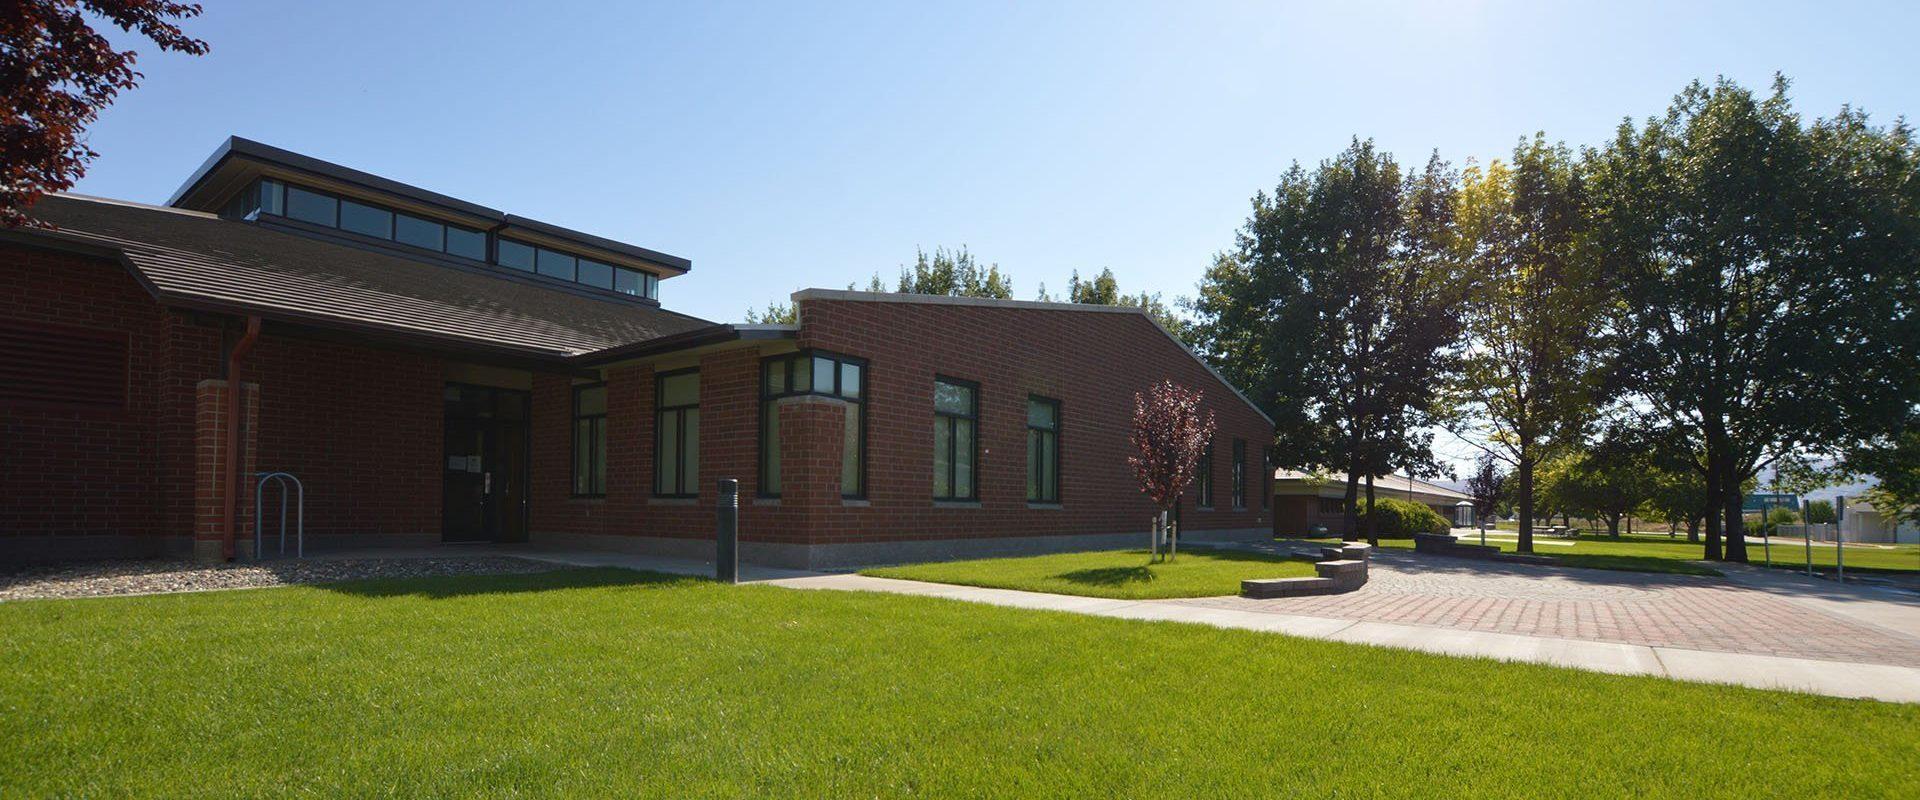 Walla Walla Community College Clarkston Nursing Expansion Exterior Photo